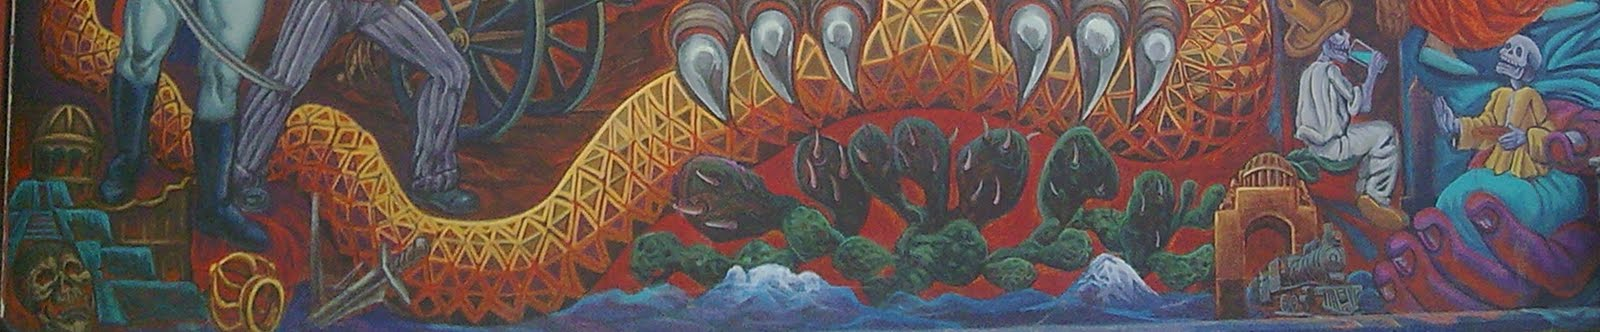 M l d l p p 8 7 for Donde esta el mural de adan zapata